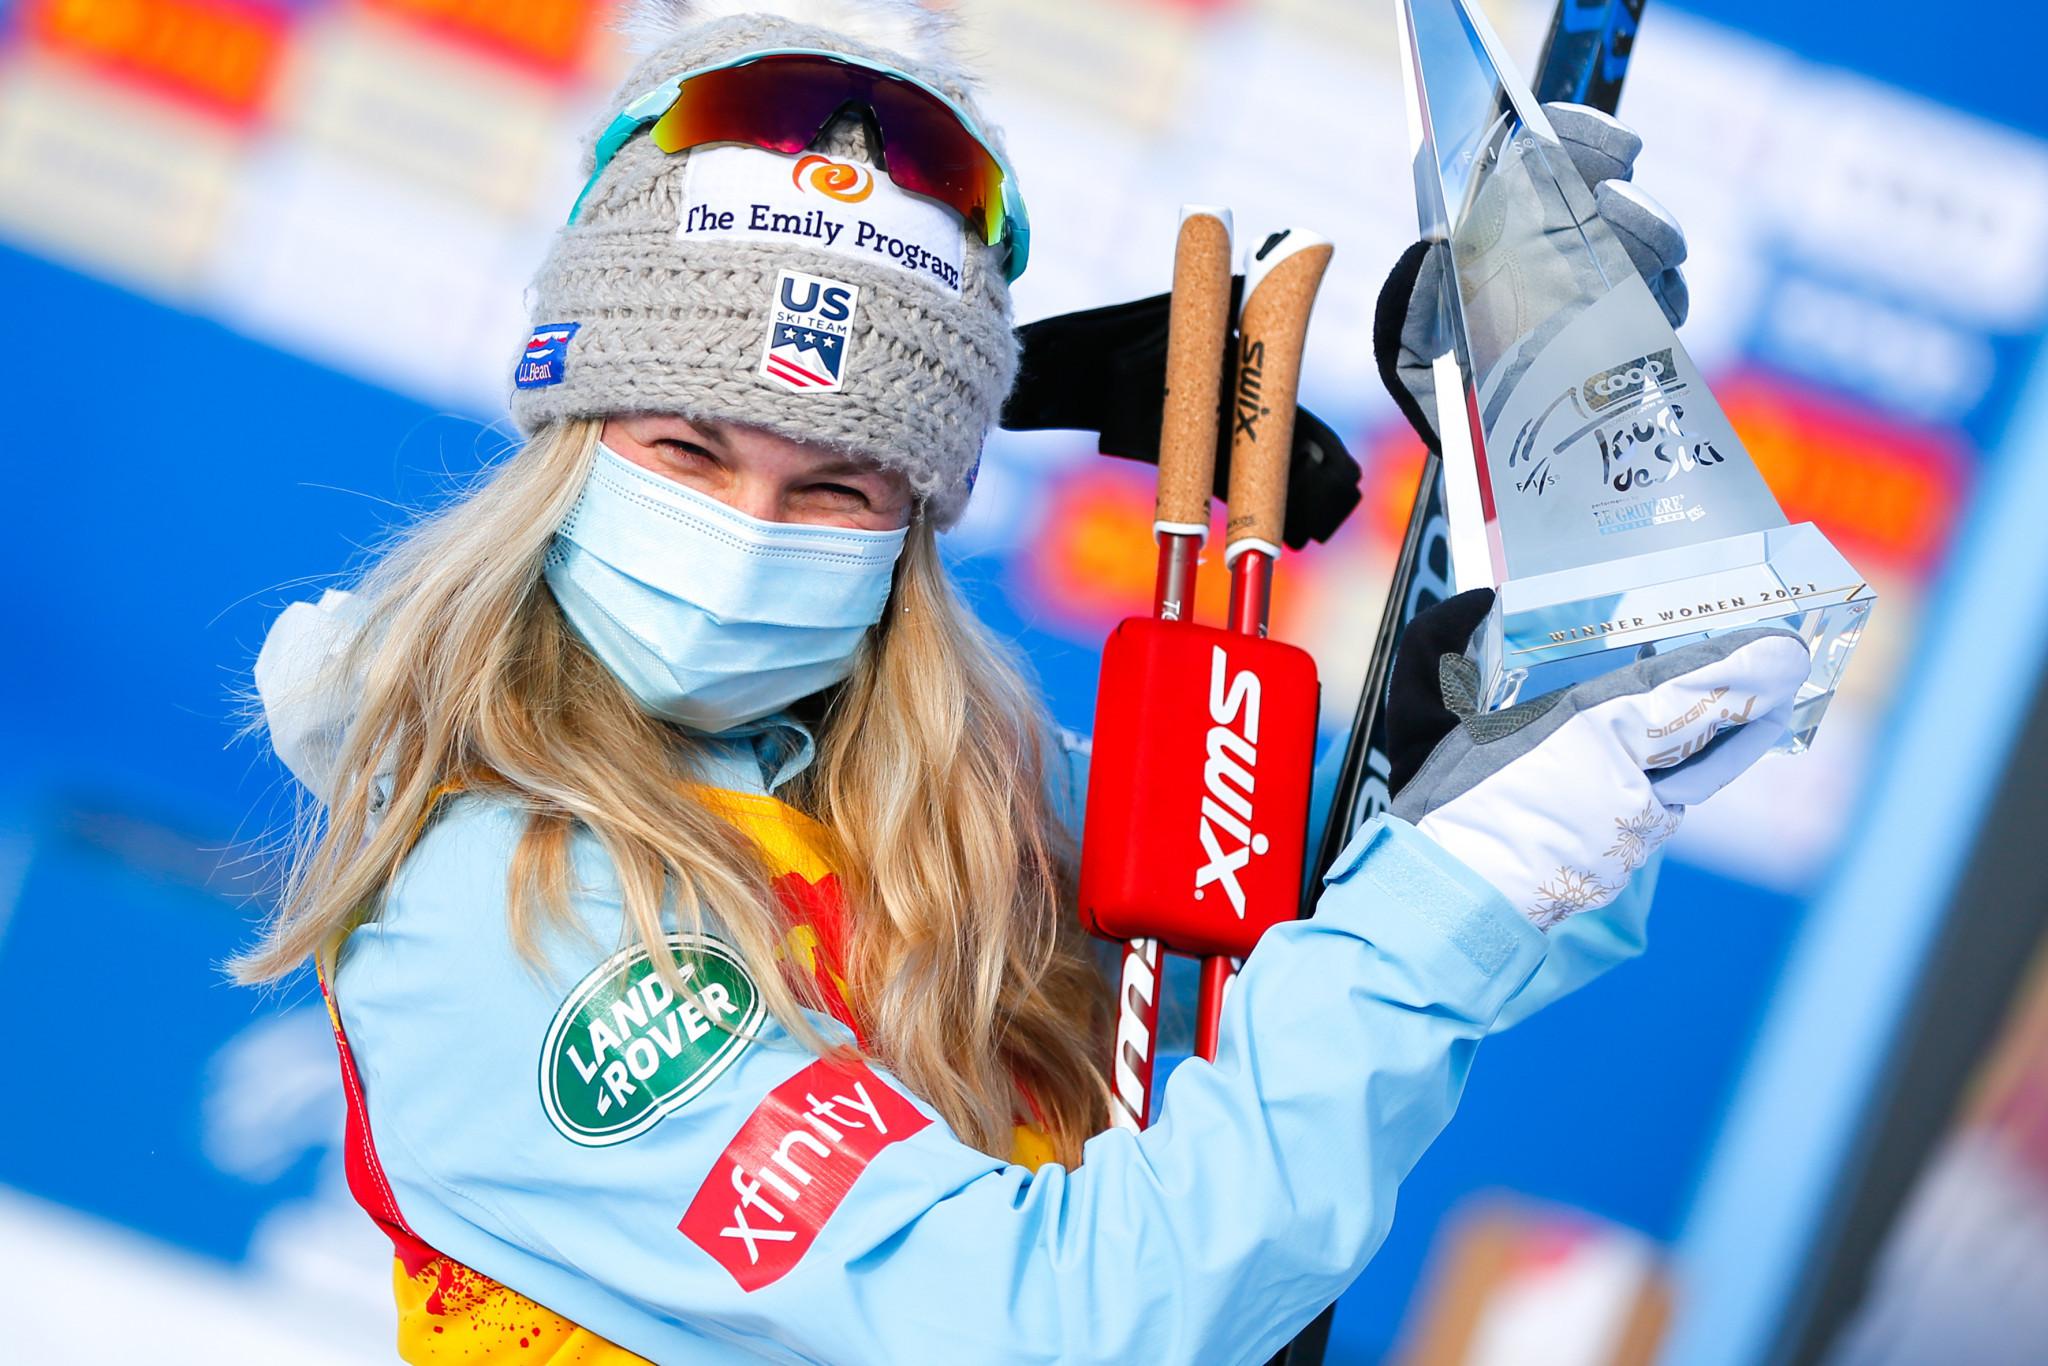 Diggins becomes first non-European athlete to win Tour de Ski